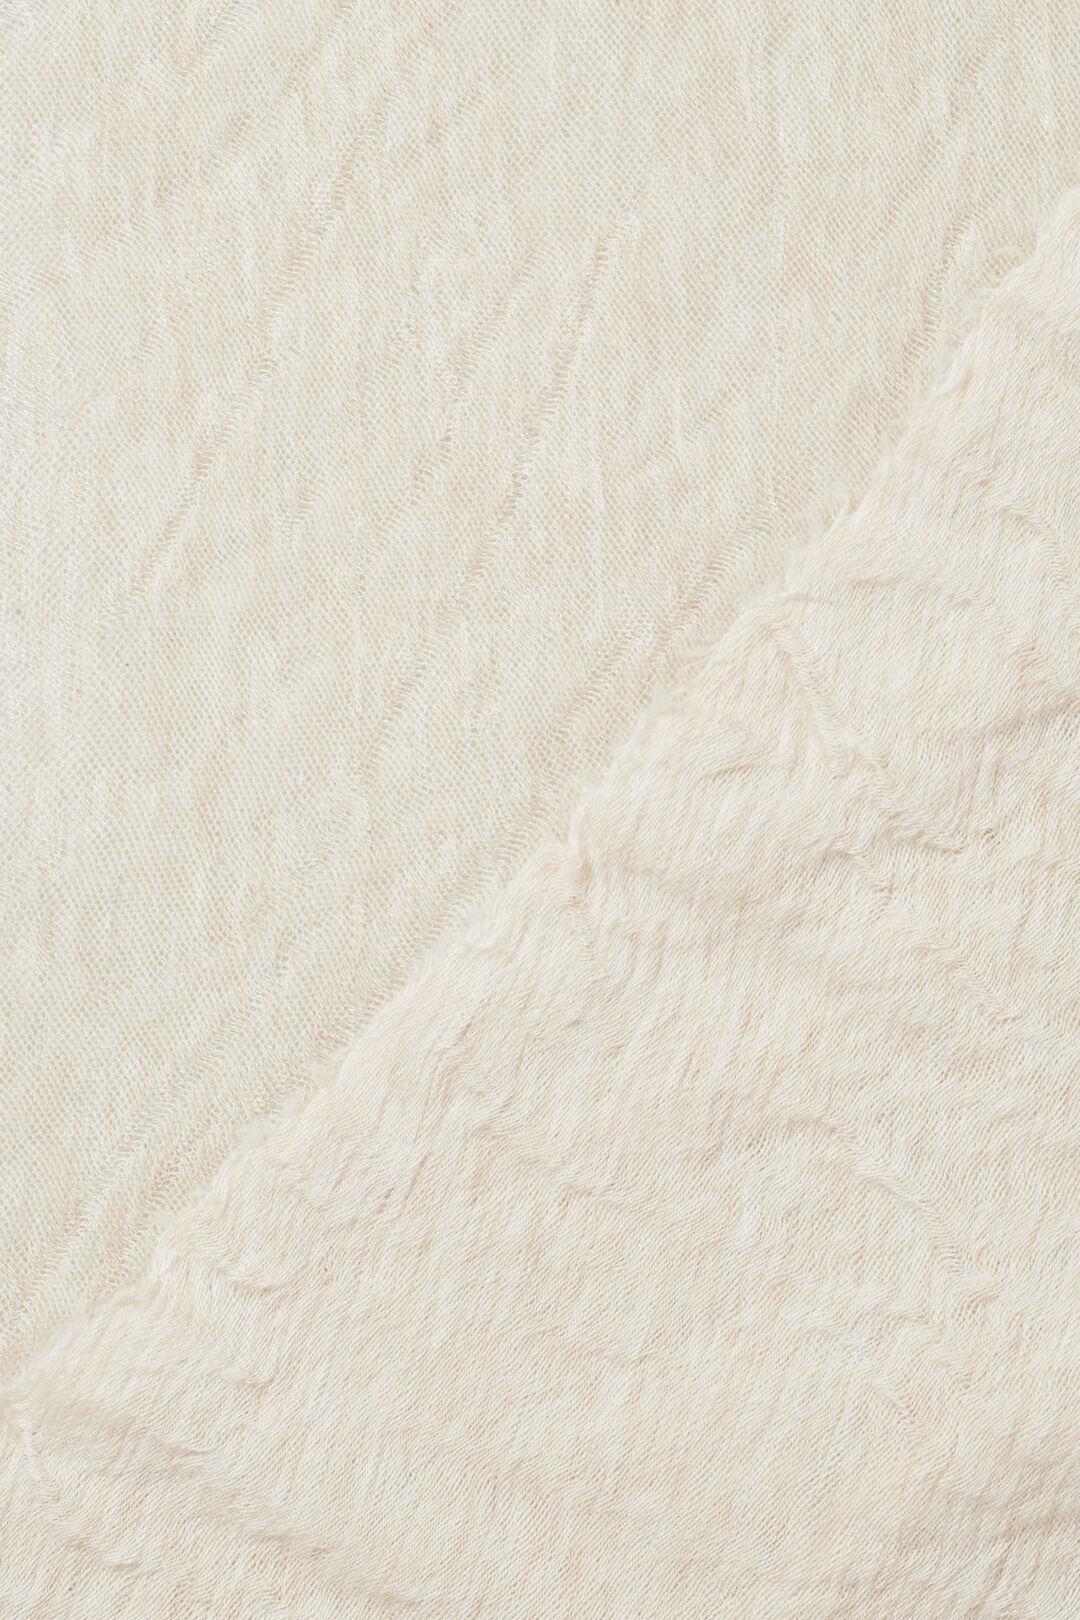 Fine Knit Wrap  Fossil Marle  hi-res